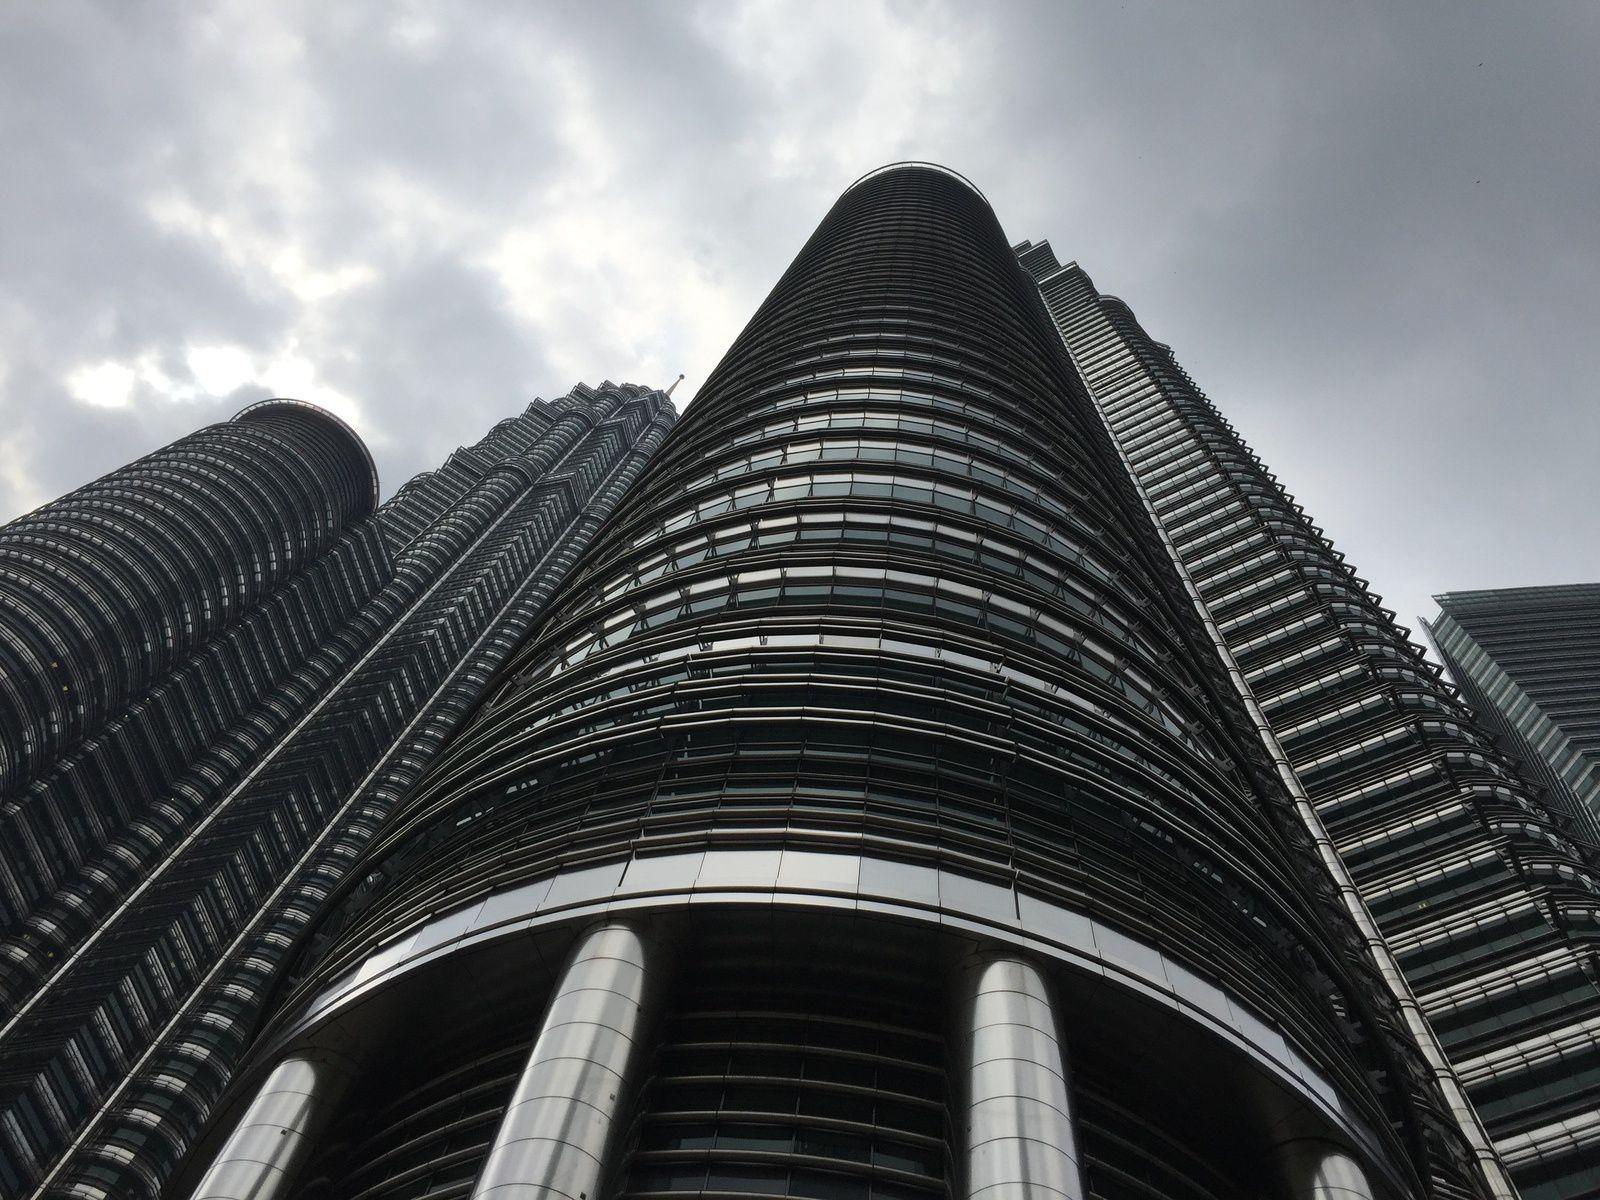 Tour Petronas vue d'en bas